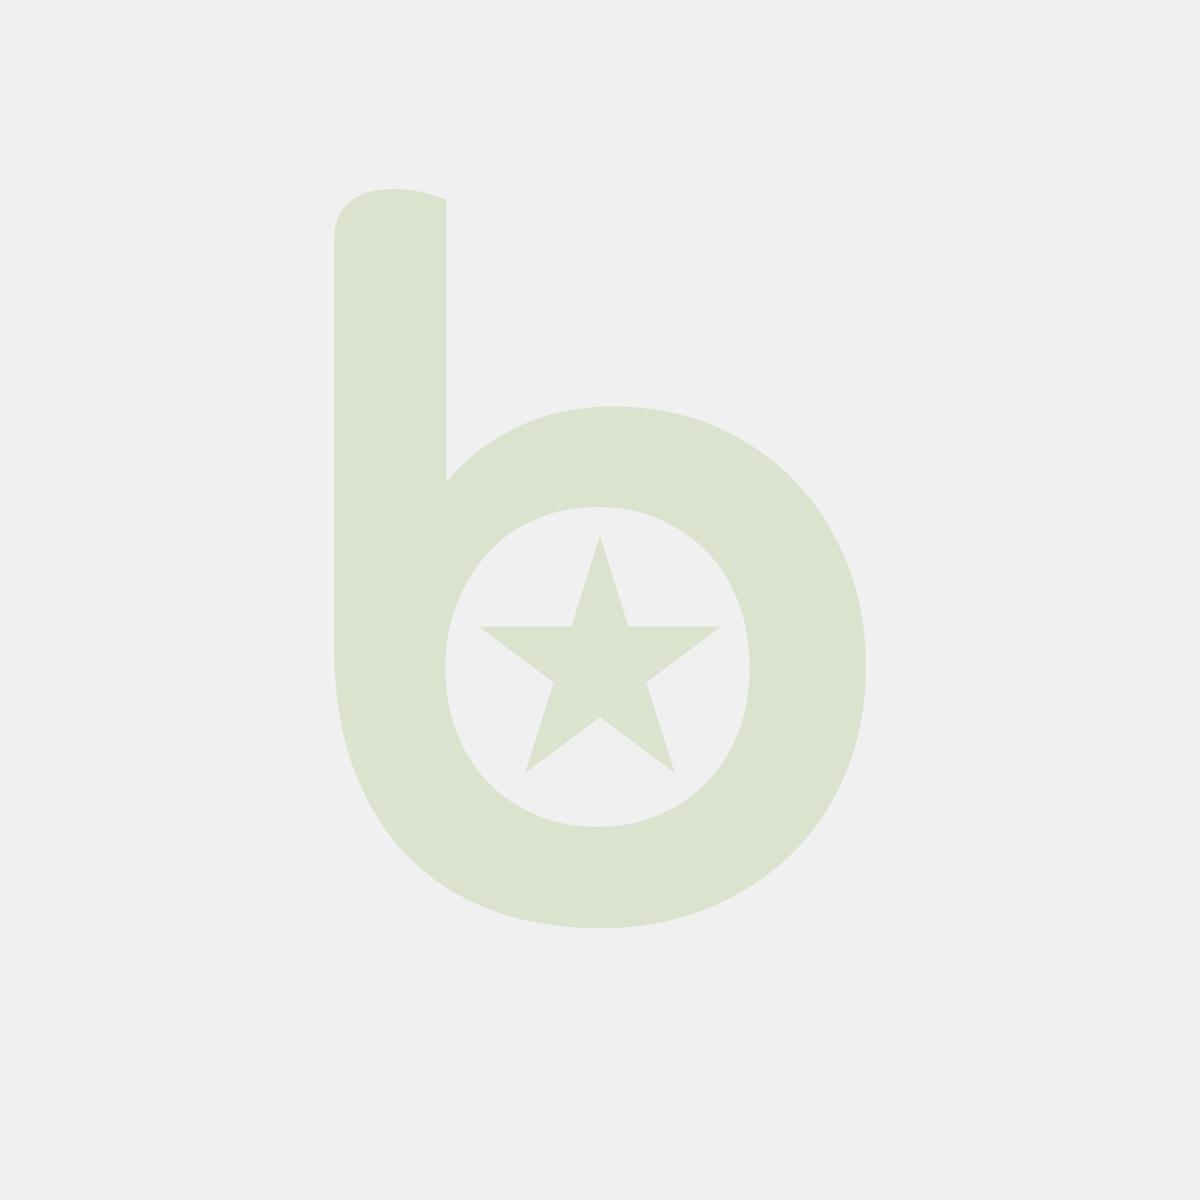 Taca GN 1/1 z melaminy kod 566008